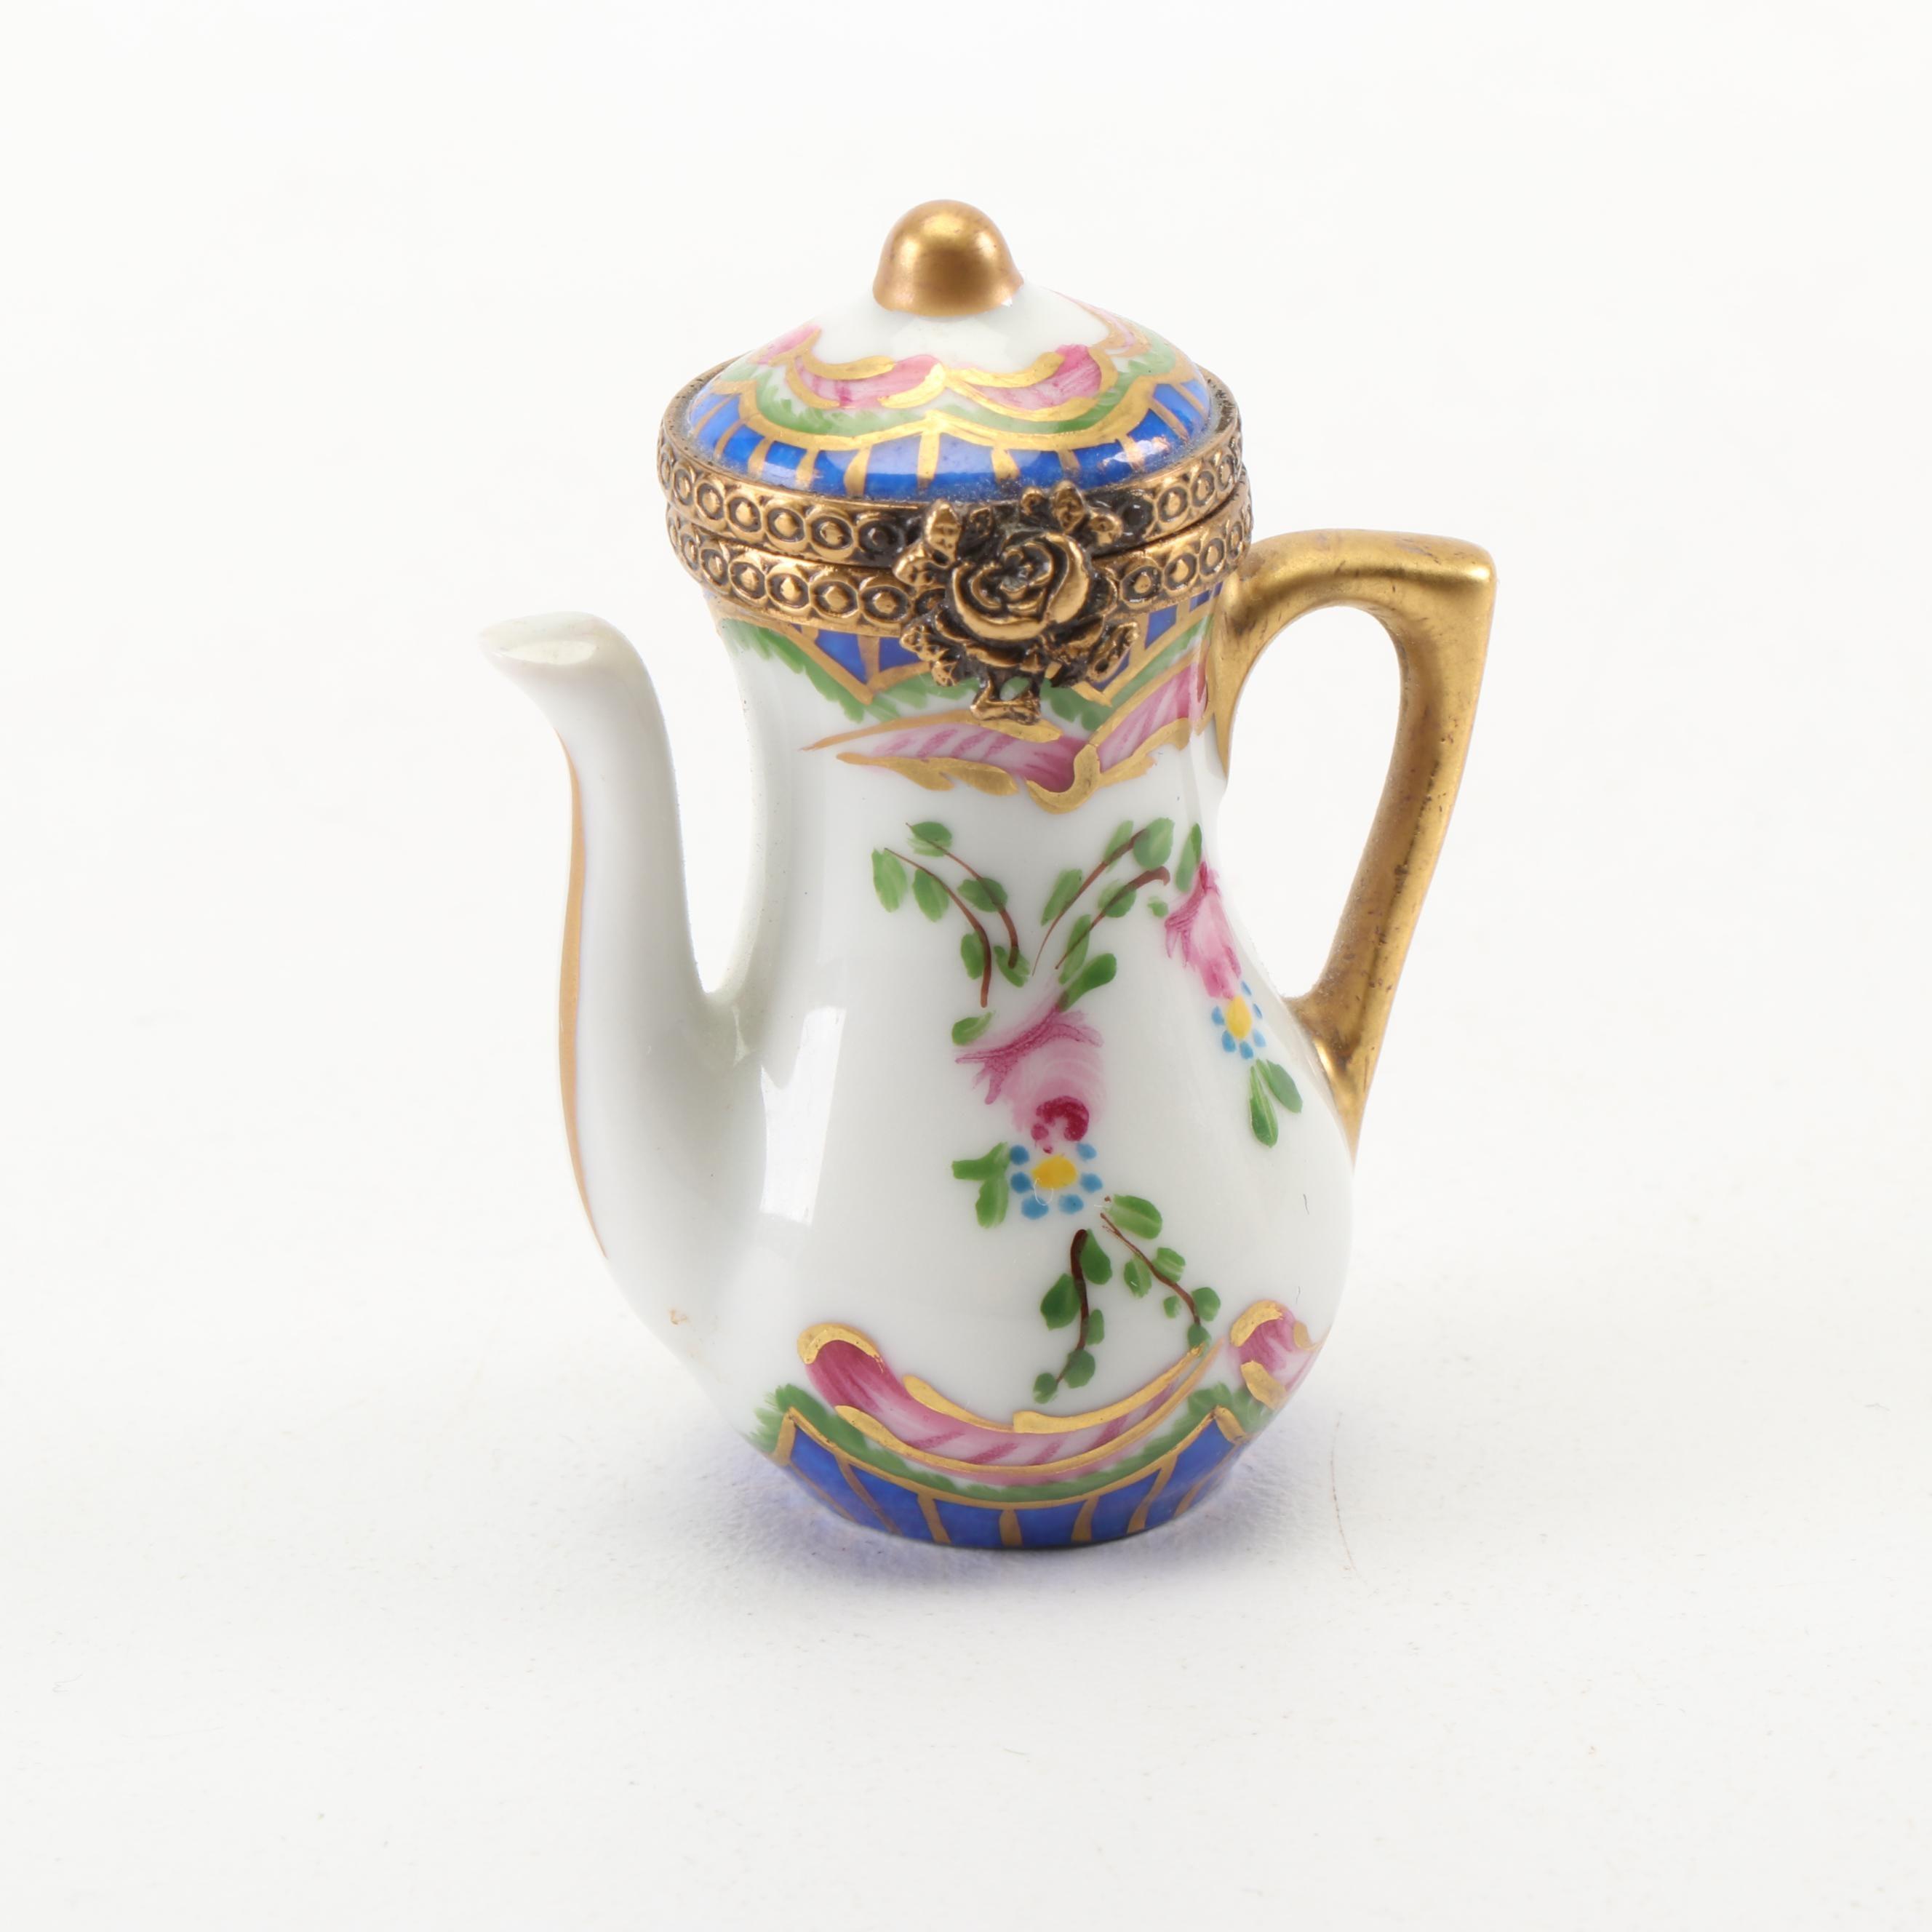 Limoges Hand-Painted Teapot Shaped Porcelain Trinket Box